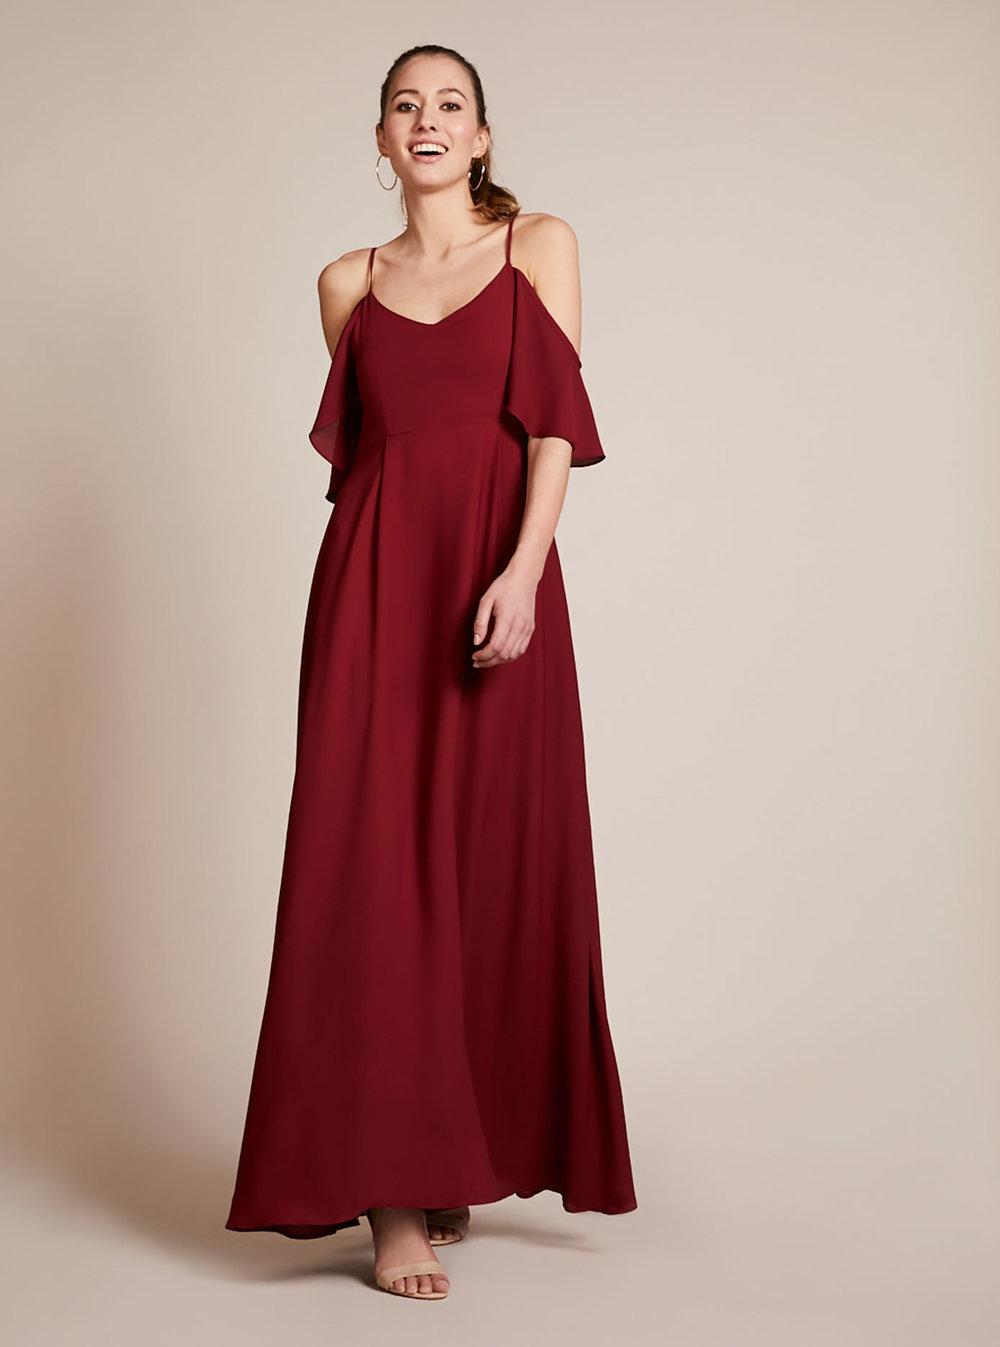 Rewritten_chianti_mykonos_dress_bridesmaids_red_1.jpg